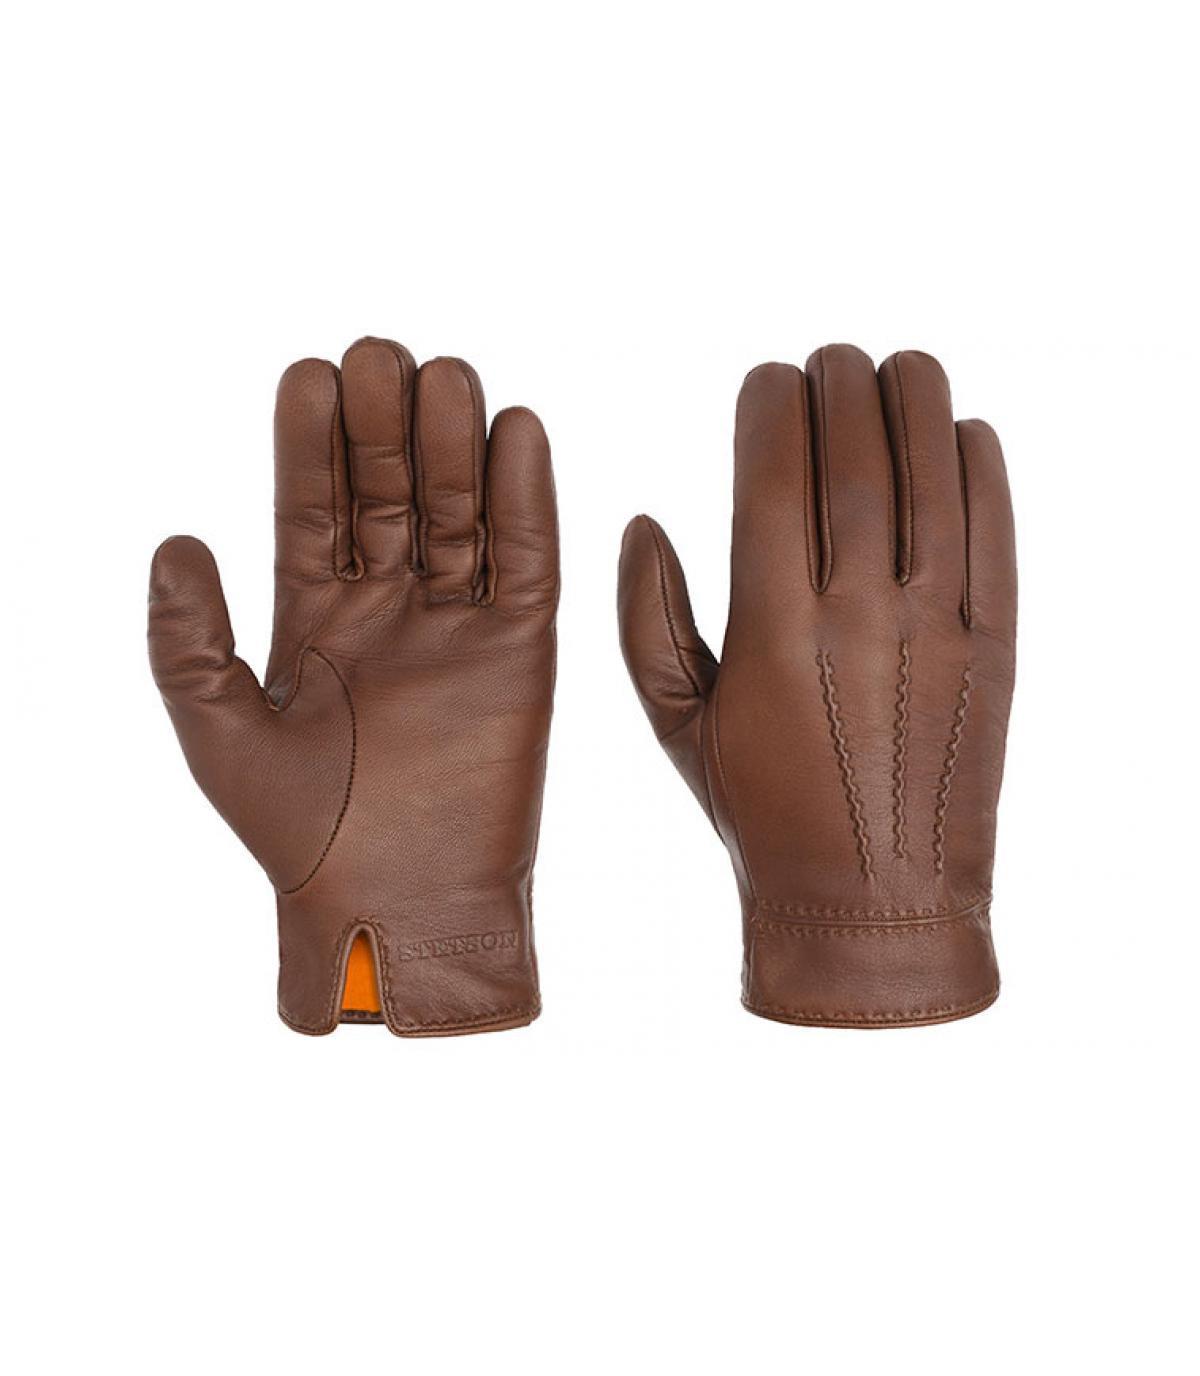 Brown guanti di pelle Stetson